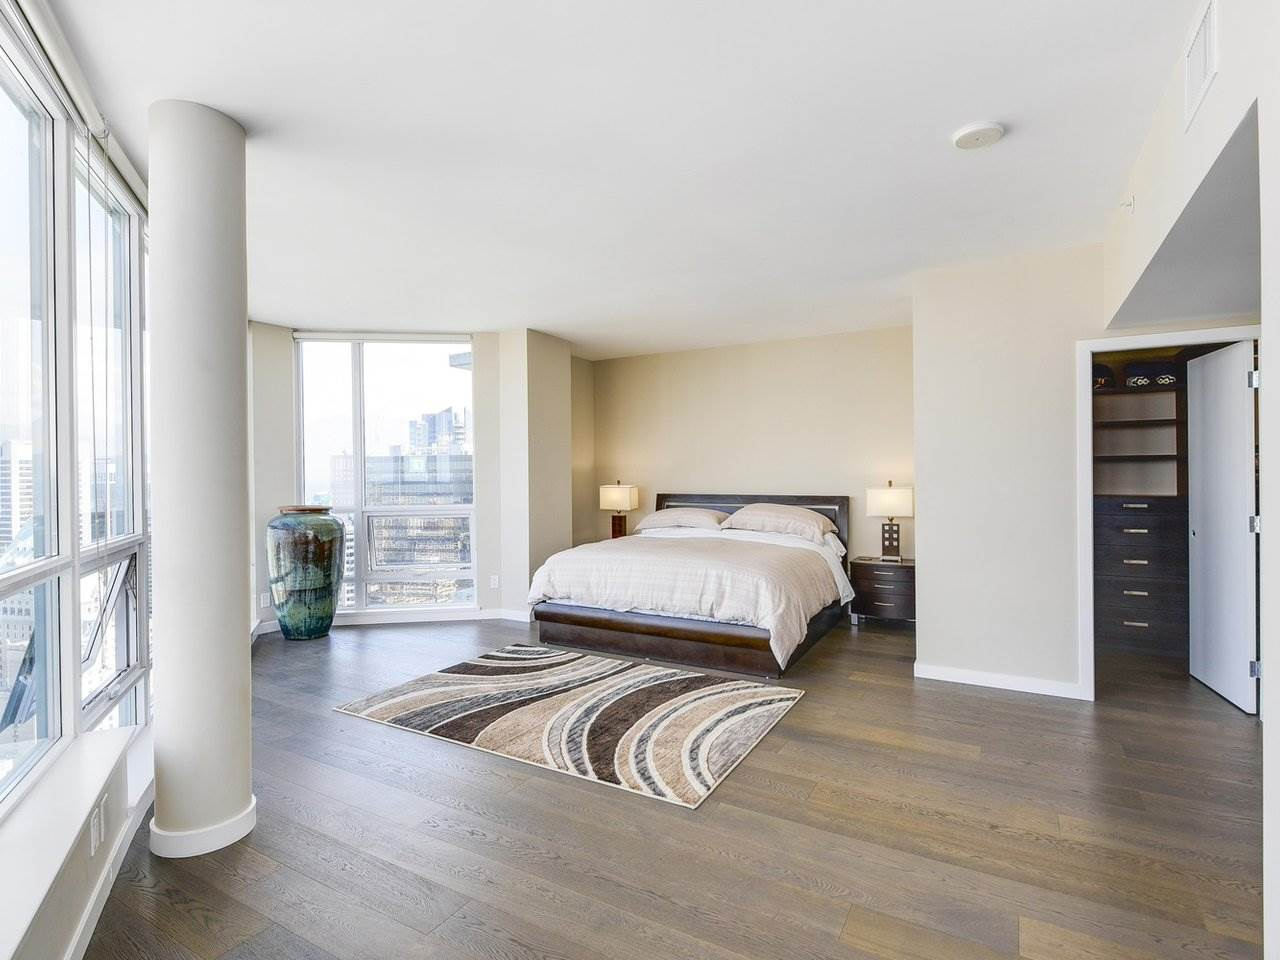 Condo Apartment at PH3 833 SEYMOUR STREET, Unit PH3, Vancouver West, British Columbia. Image 10